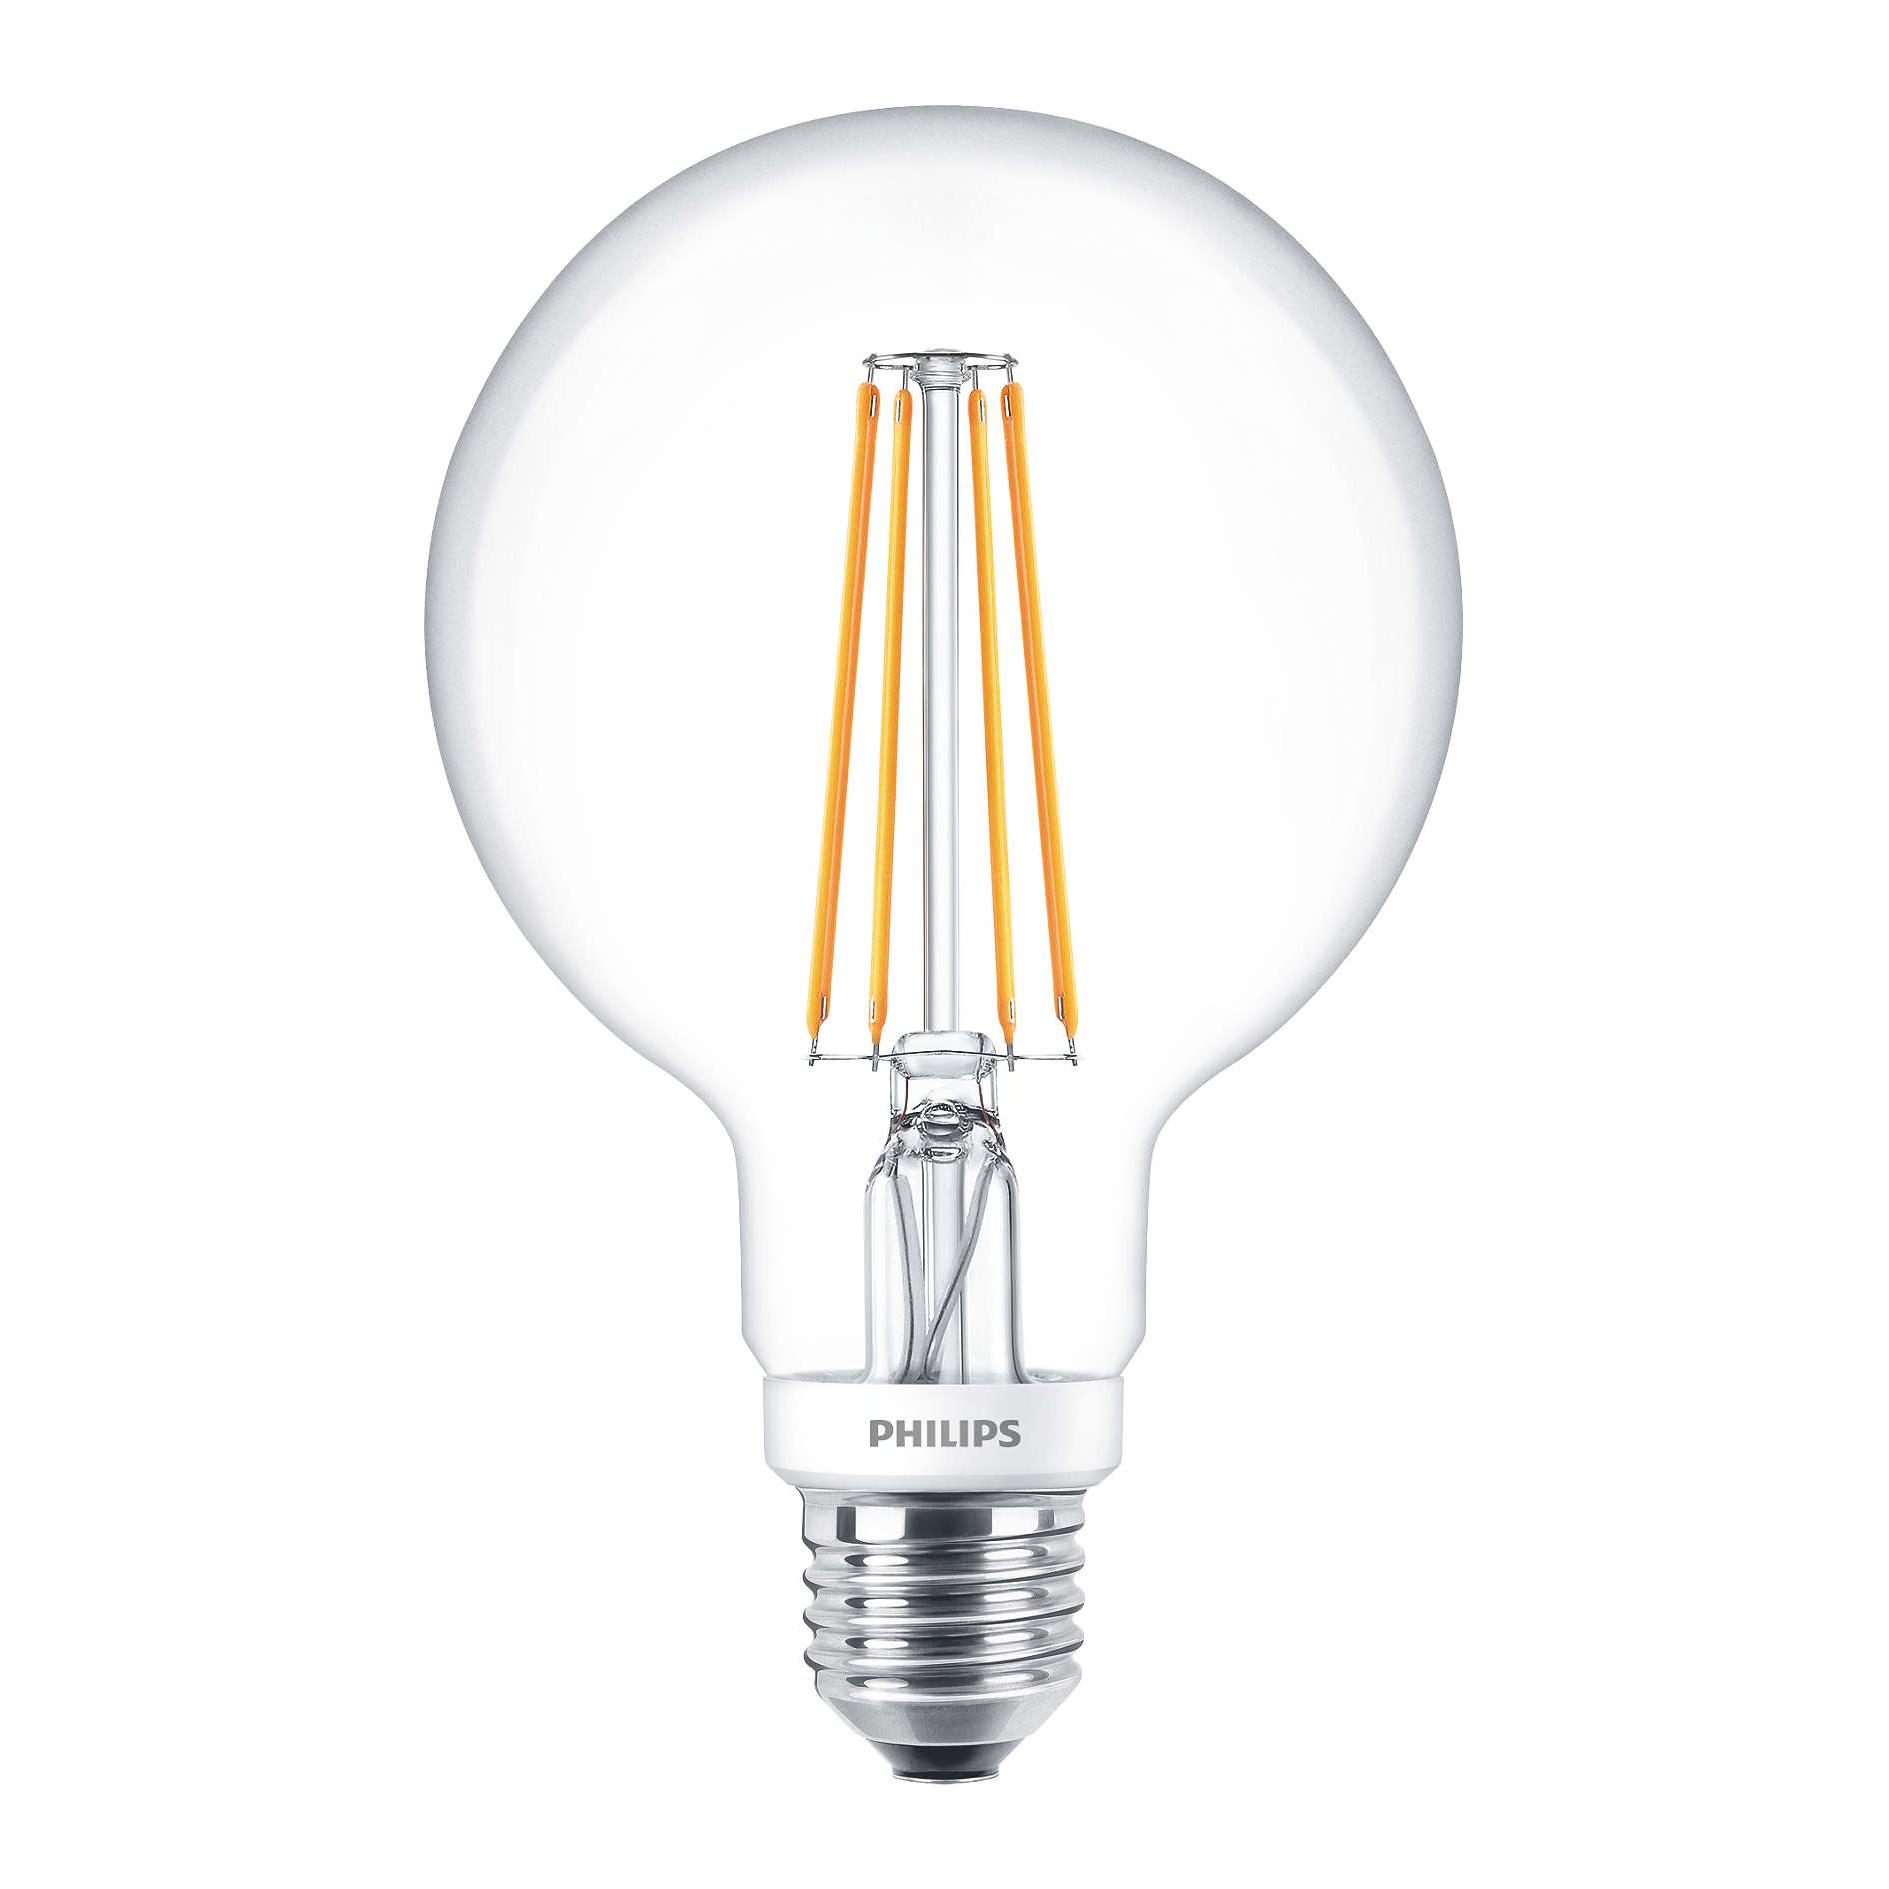 philips large led filament globe clear g93 e27 7w 2700k. Black Bedroom Furniture Sets. Home Design Ideas